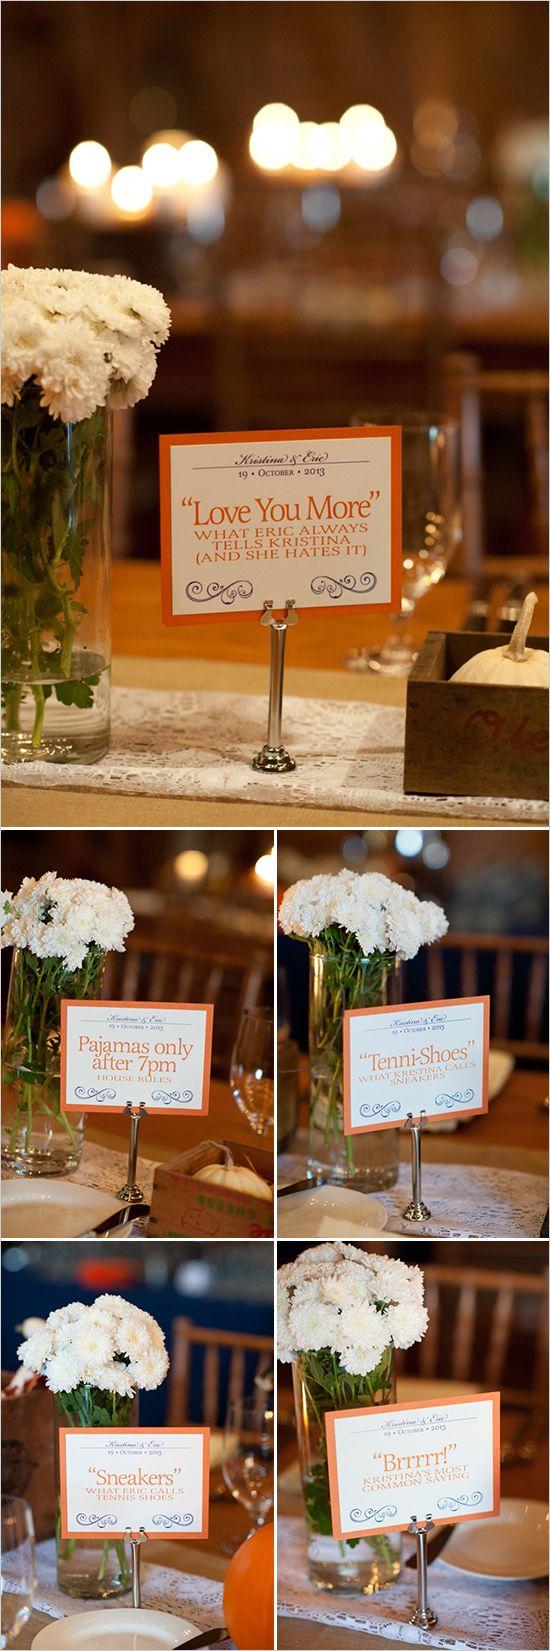 Cute couple sayings as table decor centerpieces. #weddingchicks http://www.weddingchicks.com/2014/06/23/fall-wine-country-wedding/